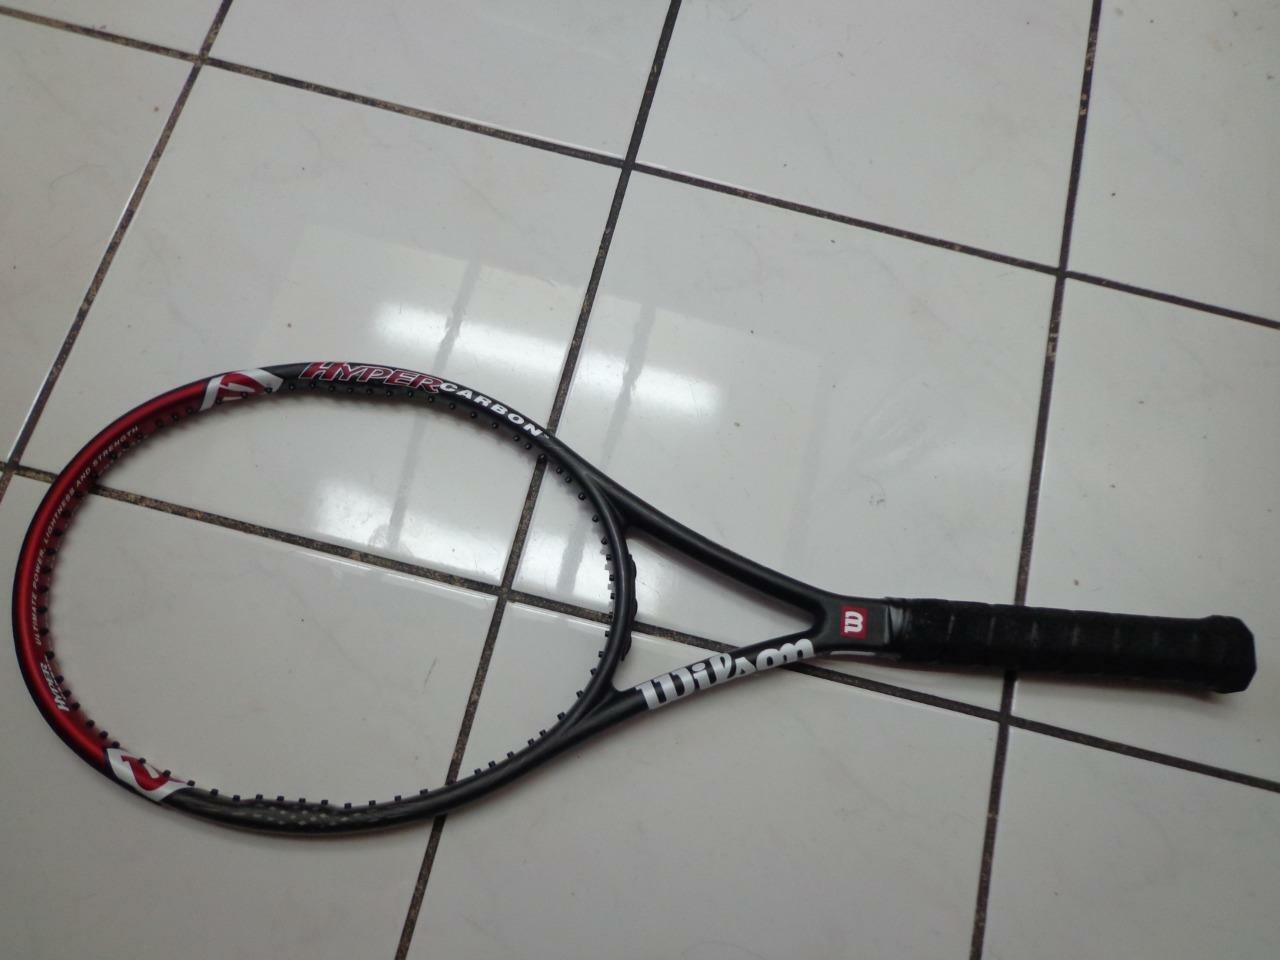 Nuevo Pro Staff Wilson Hyper 5.0 95 Stretch 4 1 2 Grip Tenis Raqueta